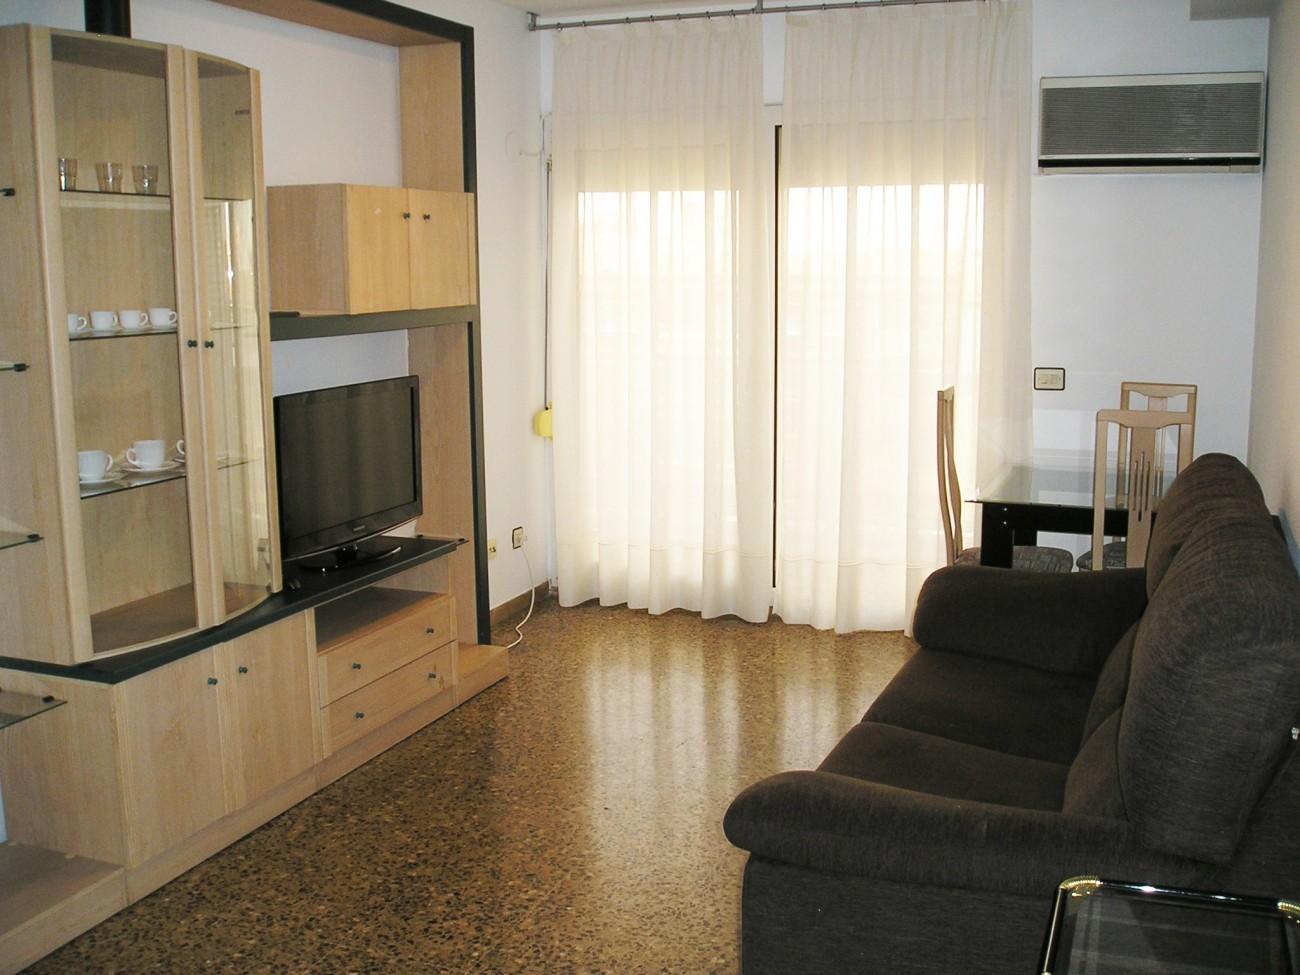 Zaragoza Centro 3000 Apartamento 2 PAX - Vakantiehuis